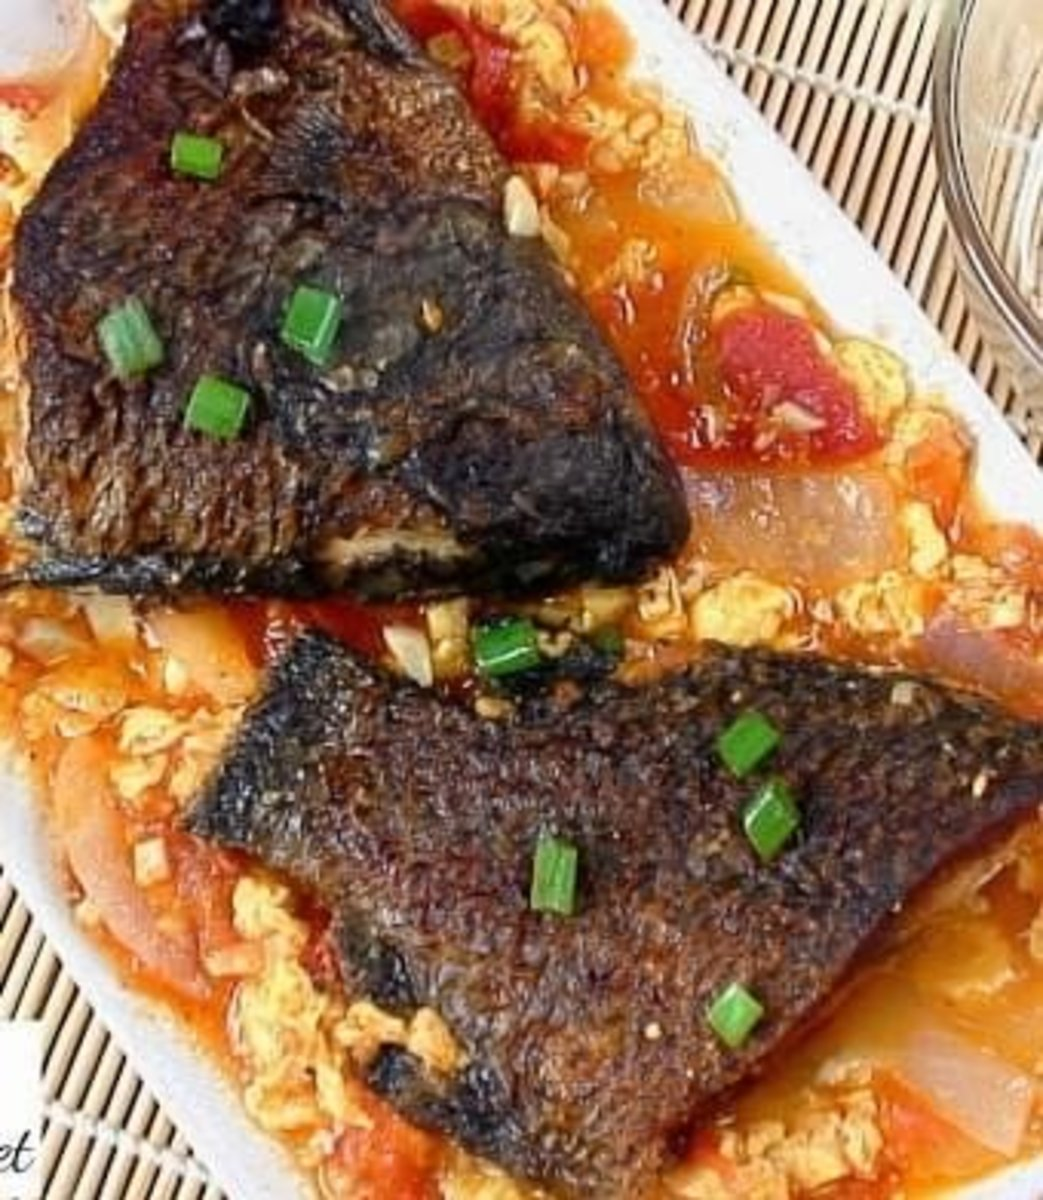 Sarciadong Isda (Filipino Fish Stew With Tomato Sauce)